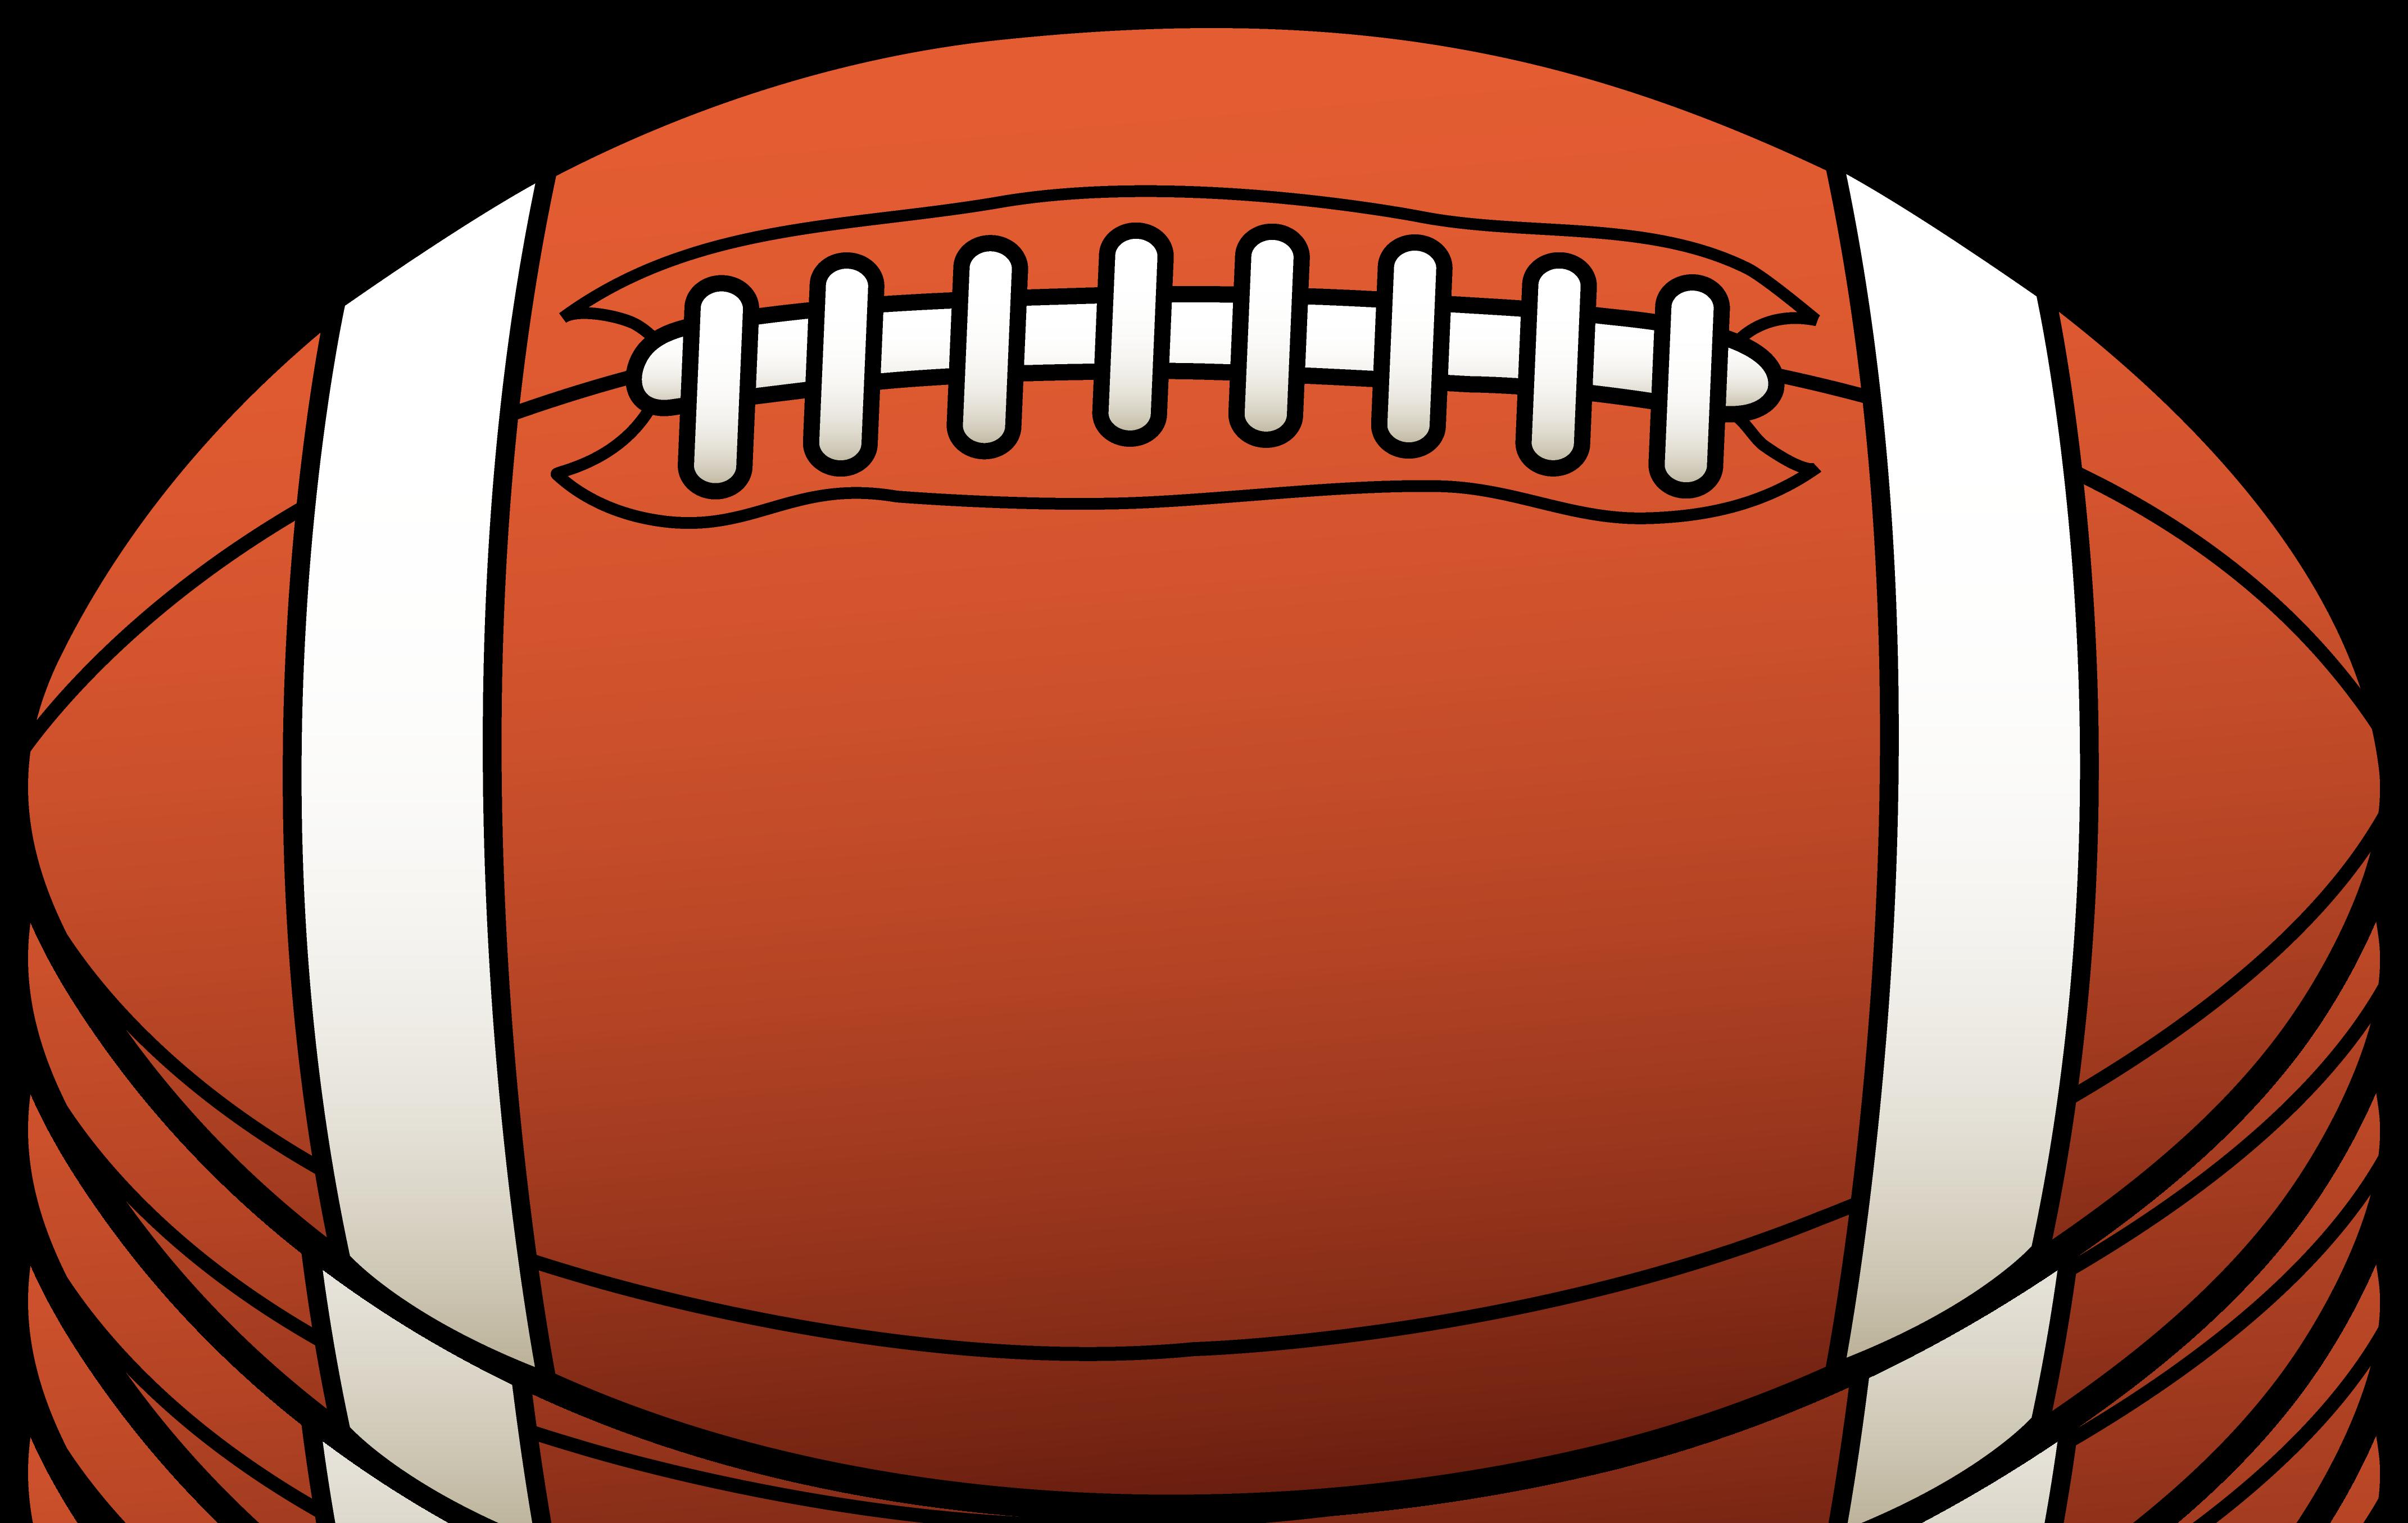 Super Bowl Clip Art - ClipArt Best